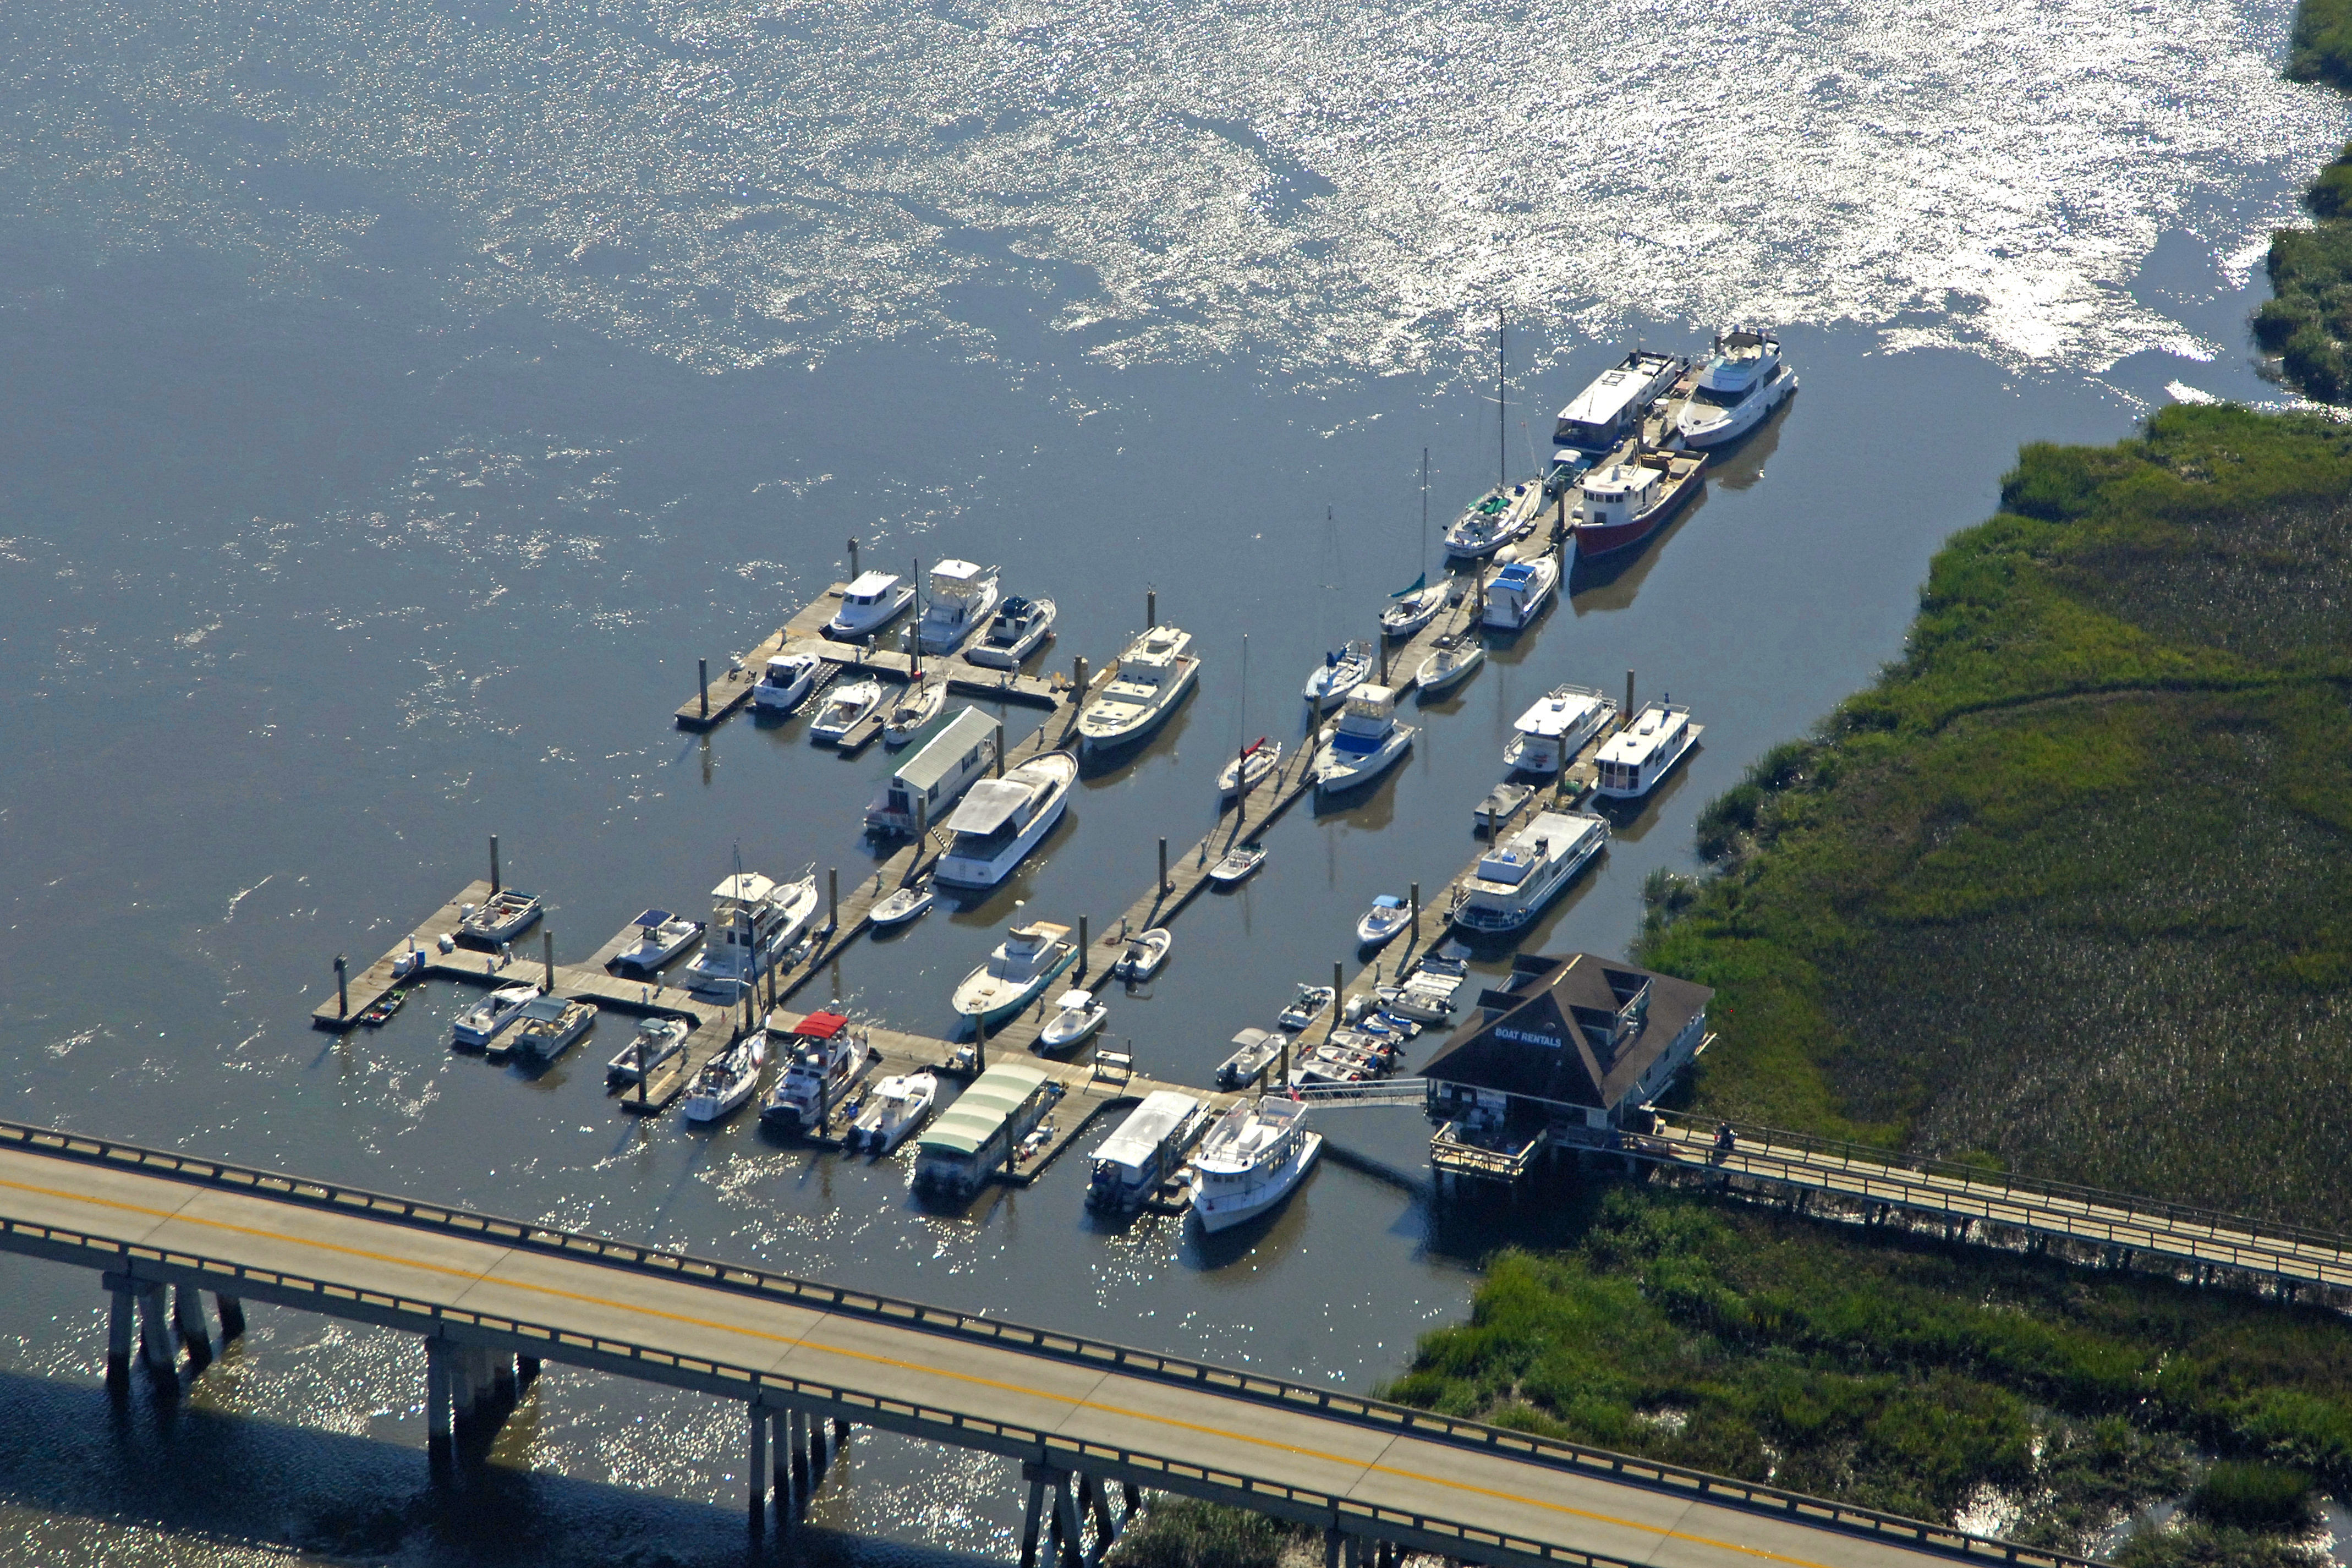 Bull river marina in savannah ga united states marina reviews bull river marina nvjuhfo Images